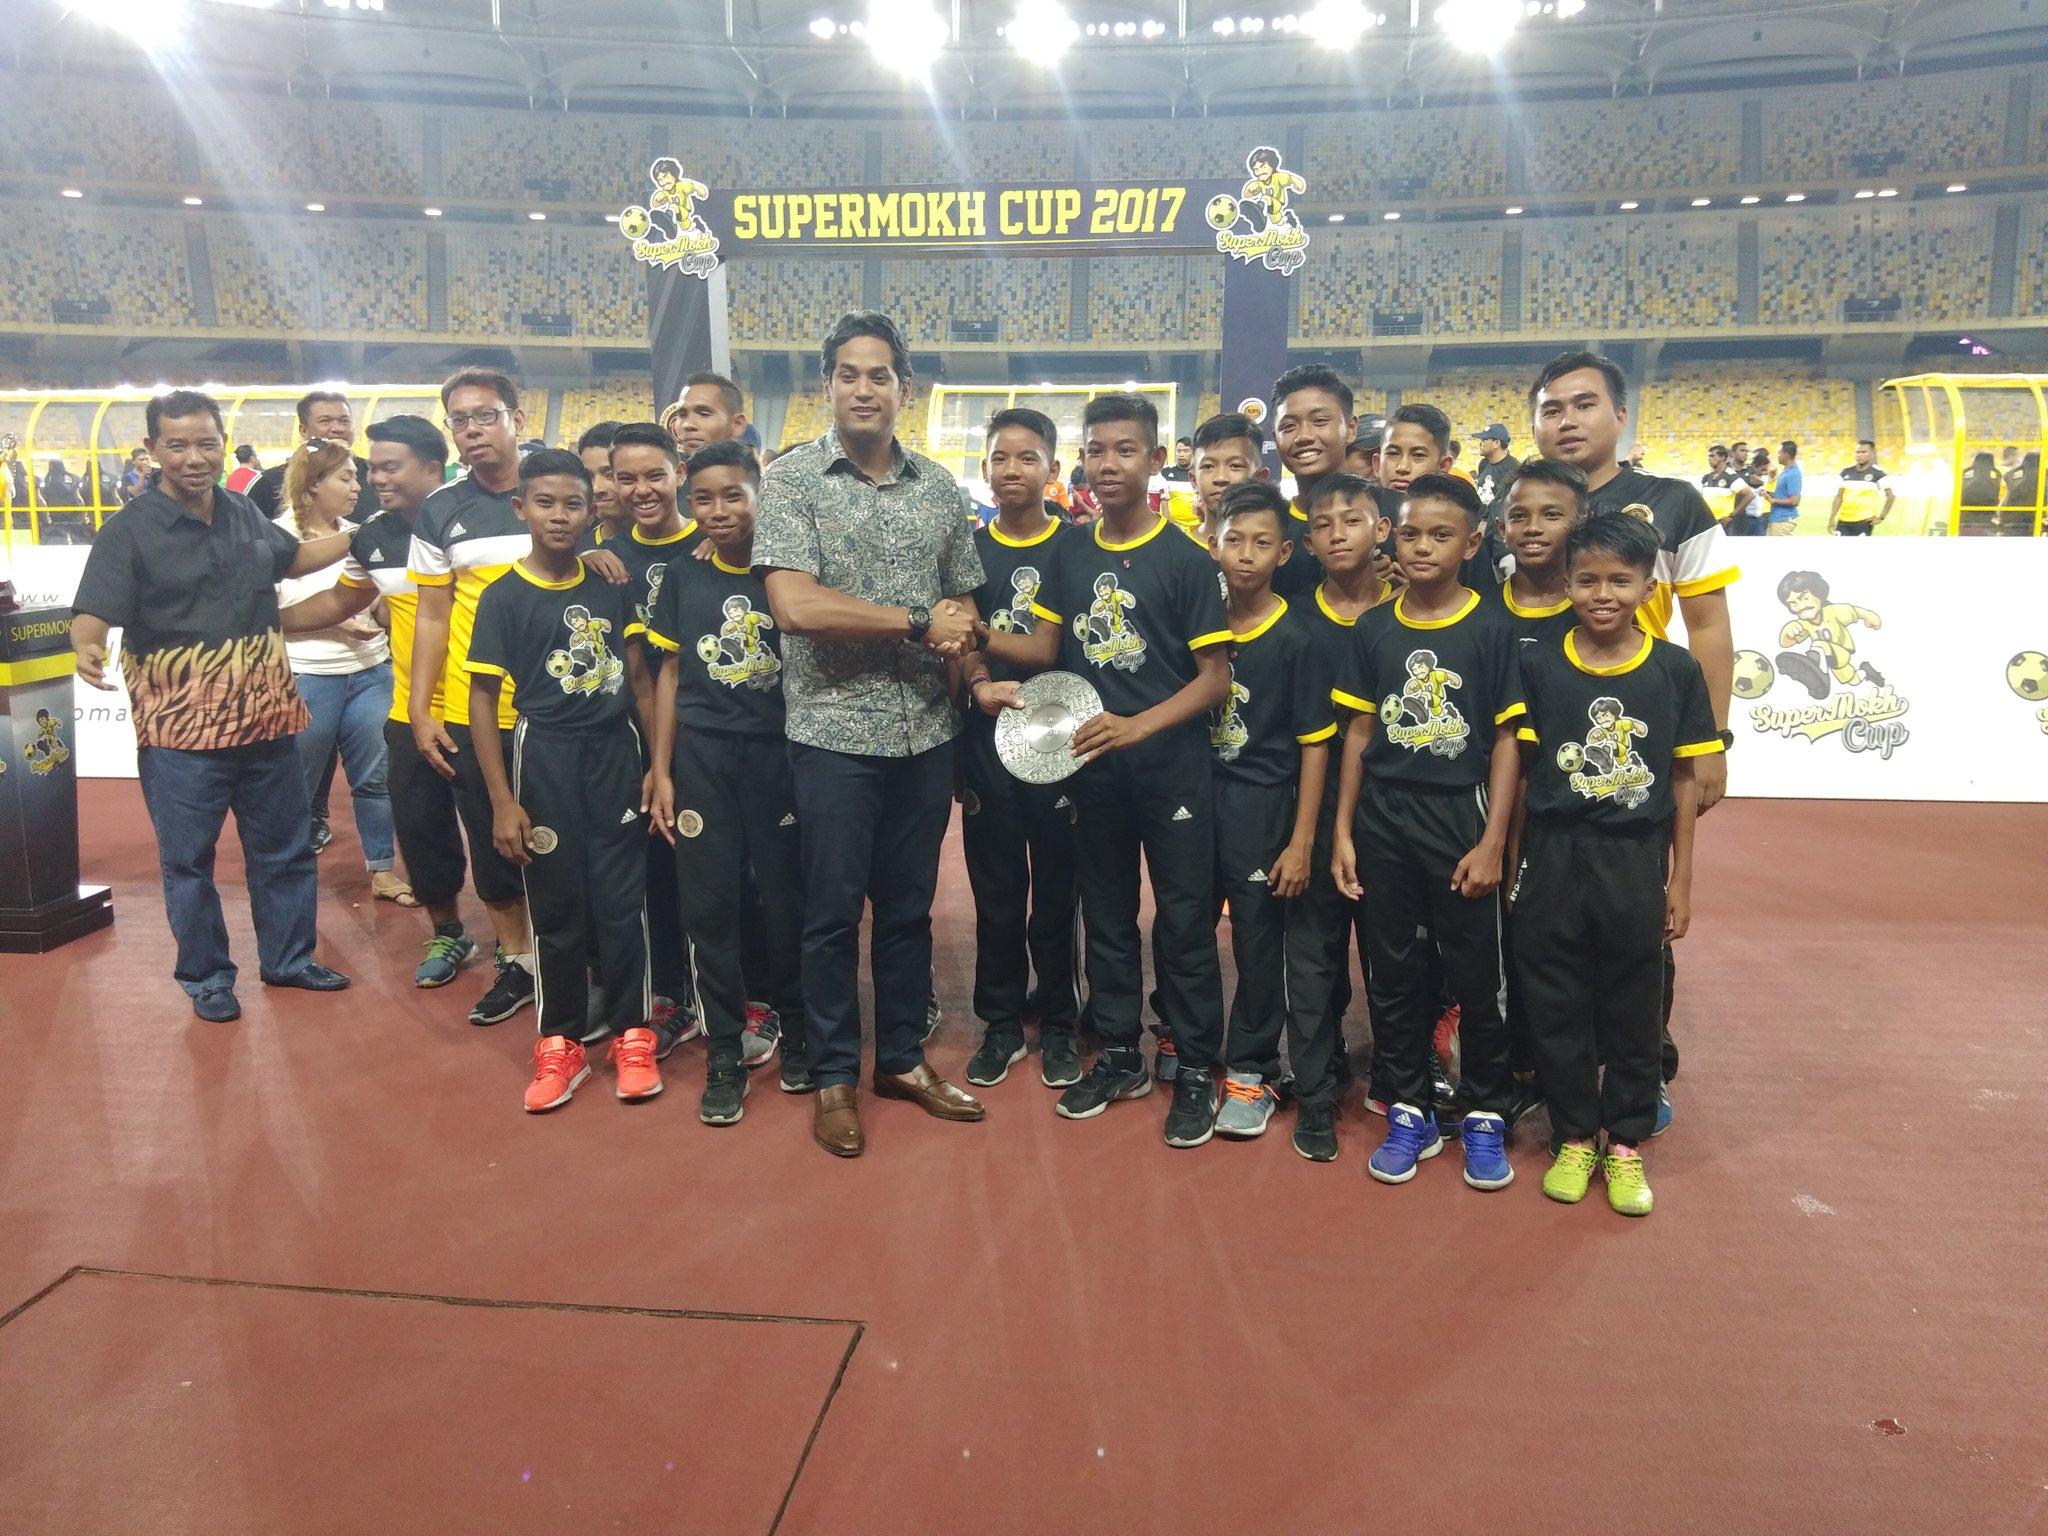 Khairy Jamaluddin, Supermokh Cup, 17122017